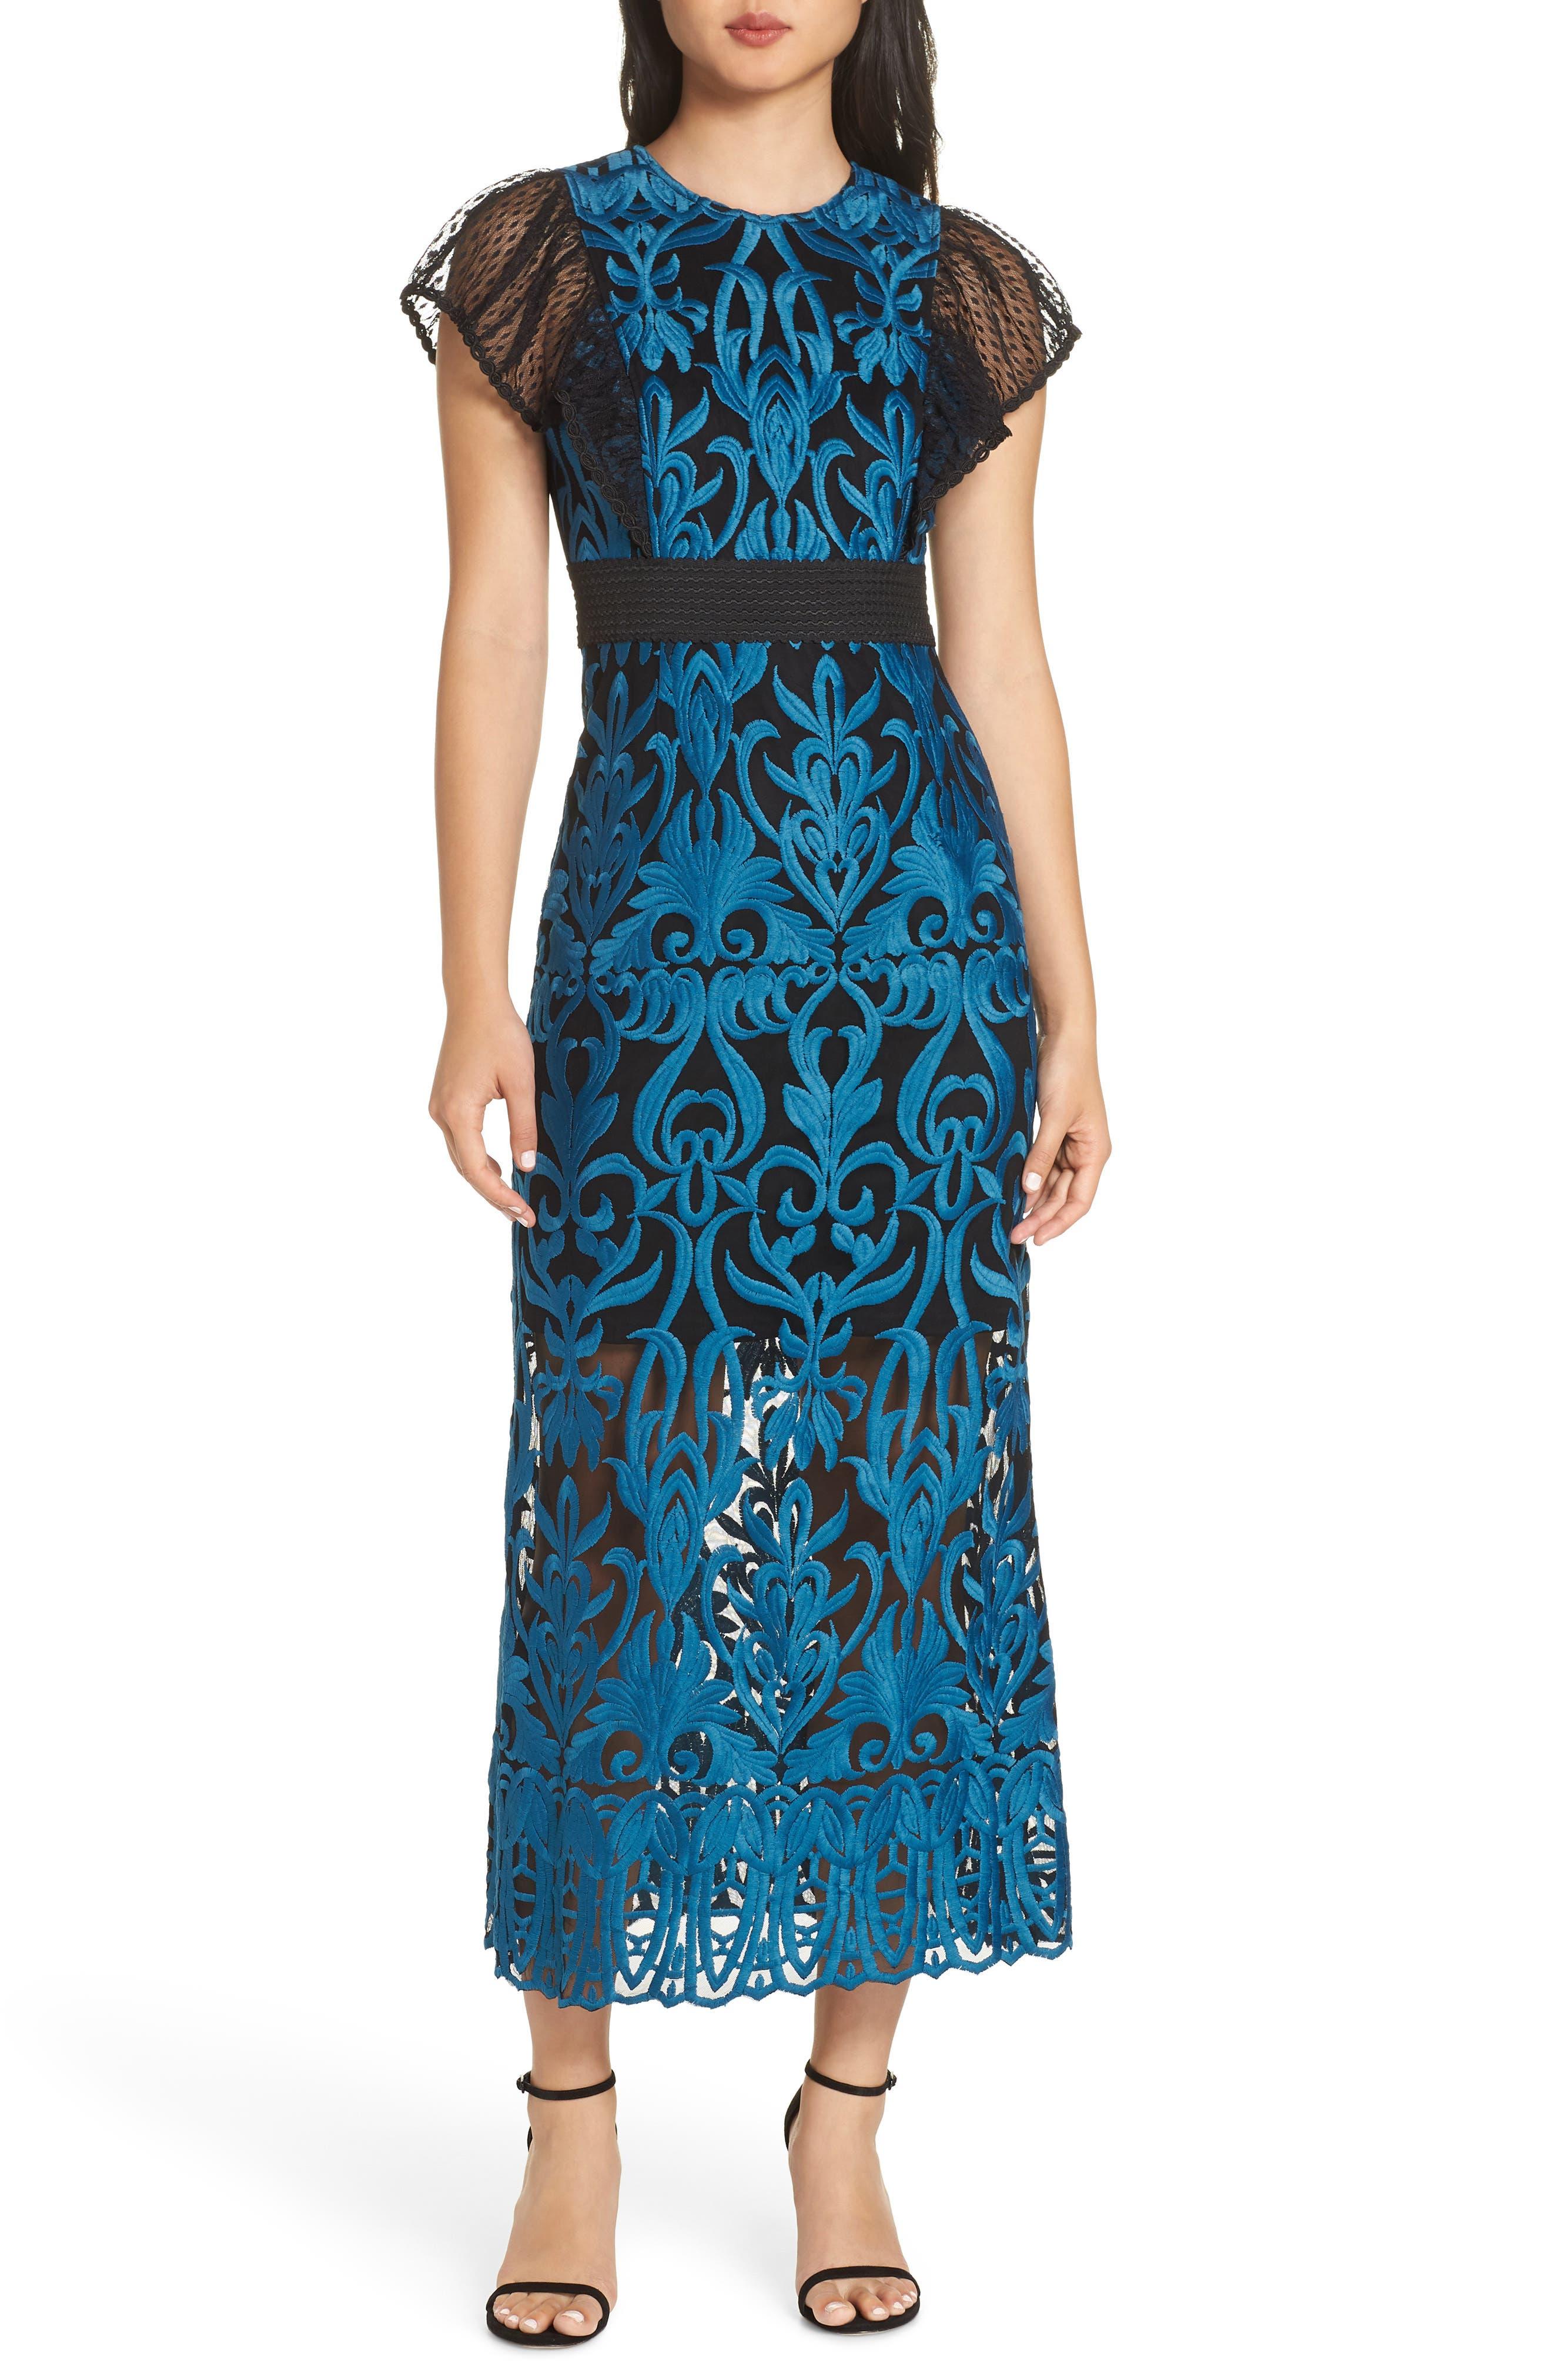 FOXIEDOX Rosalynn Lace Midi Dress, Main, color, 440